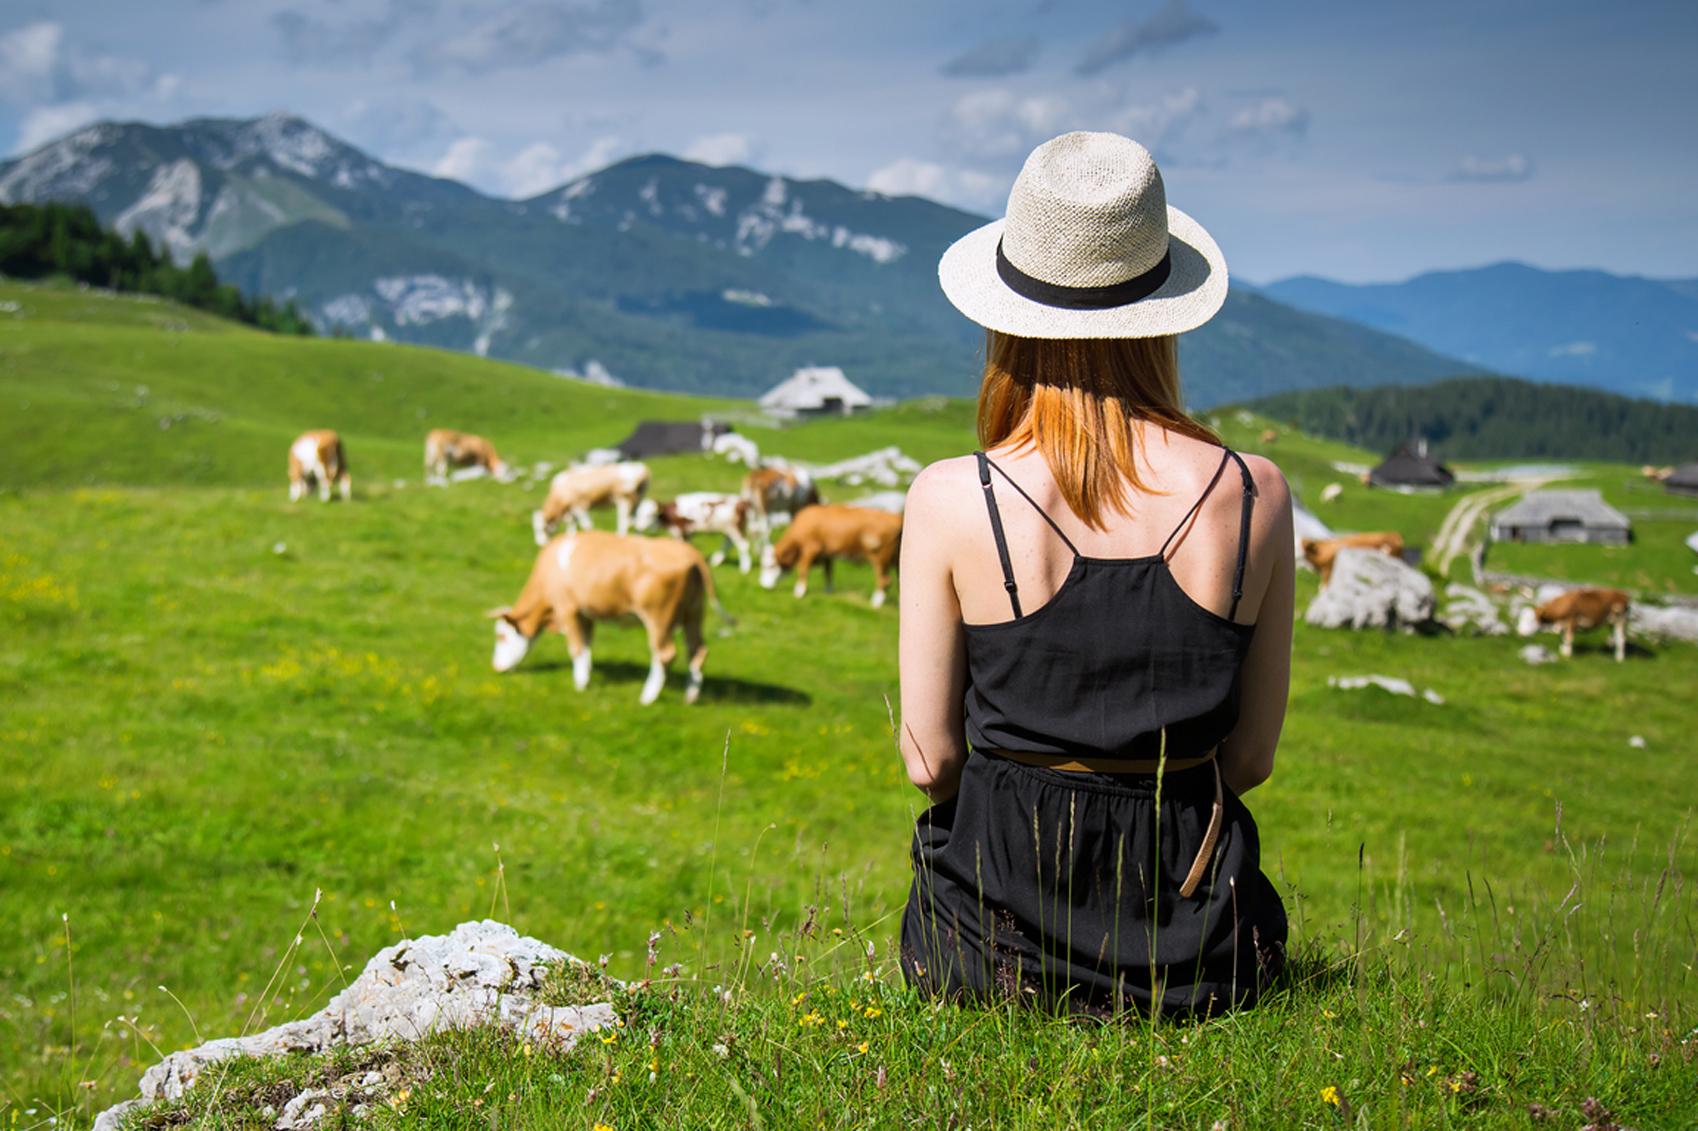 Solo travel destinations Woman-enjoys-views-of-the-alpine-village-www.istockphoto.comgbphotowoman-enjoys-views-of-the-alpine-village-in-the-mountains-gm619272288-107972855-NataliaDeriabina